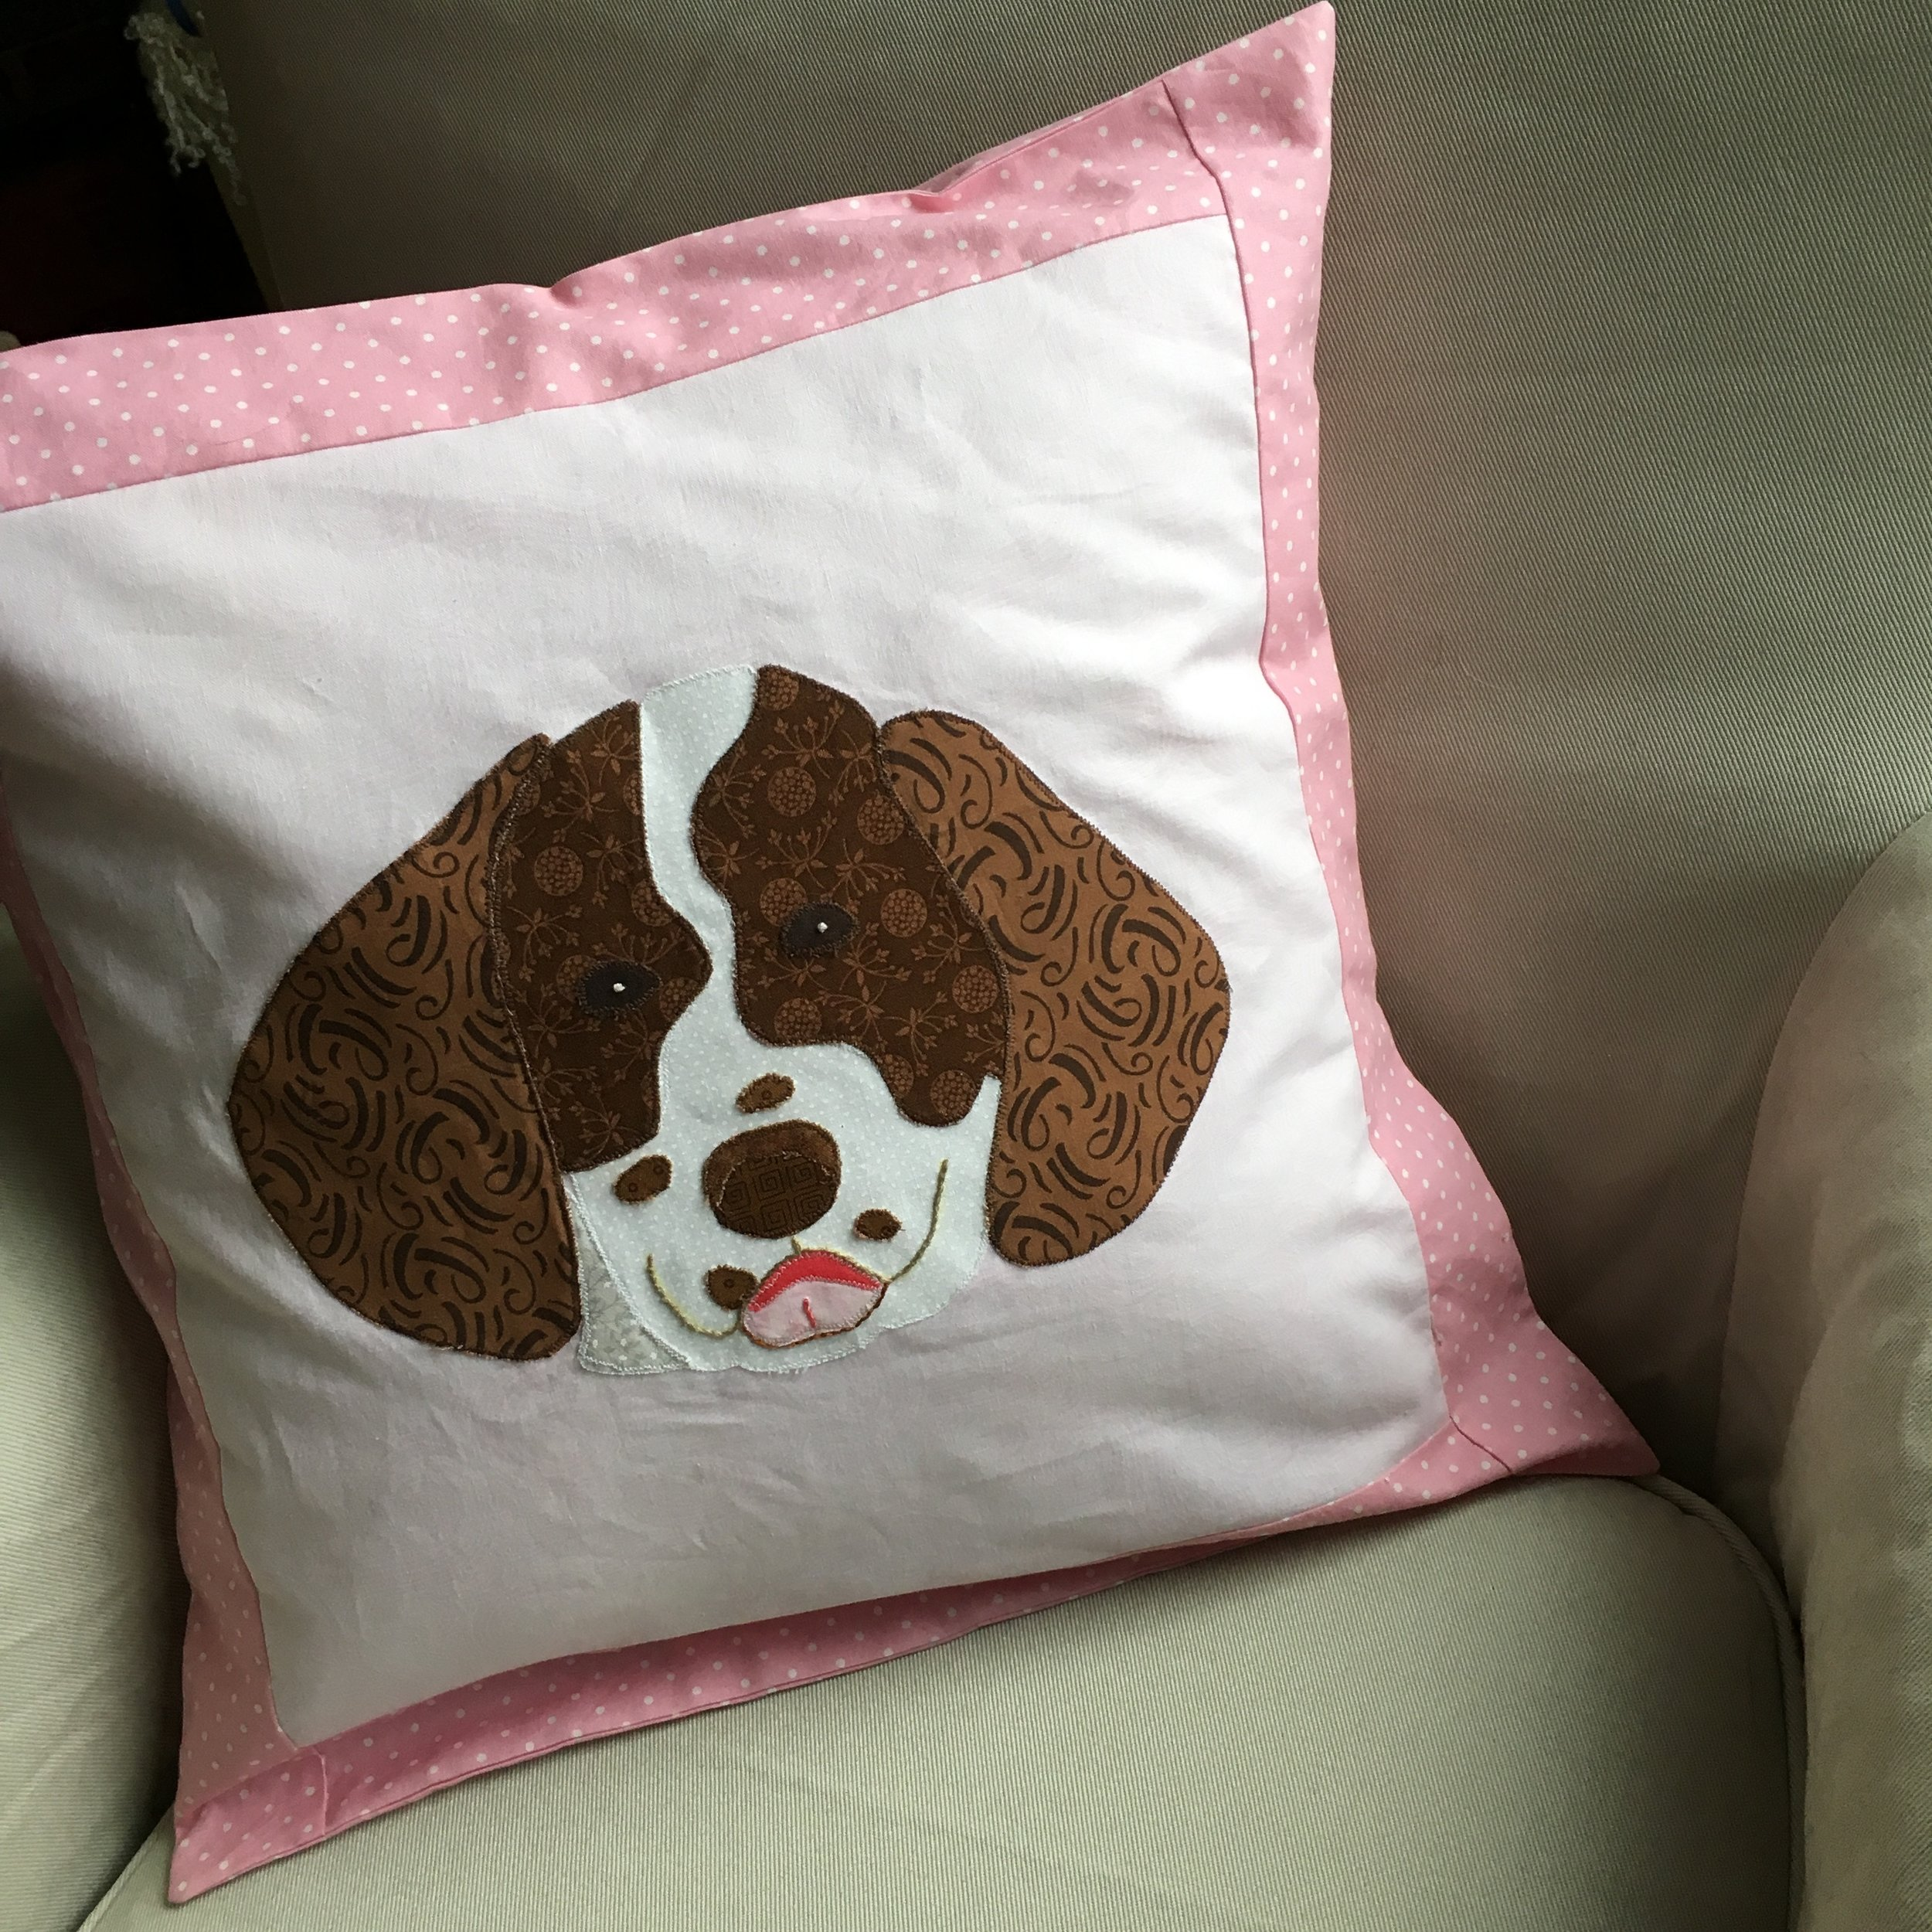 Appliqued English Springer Spaniel Envelope Pillow 16 inches square